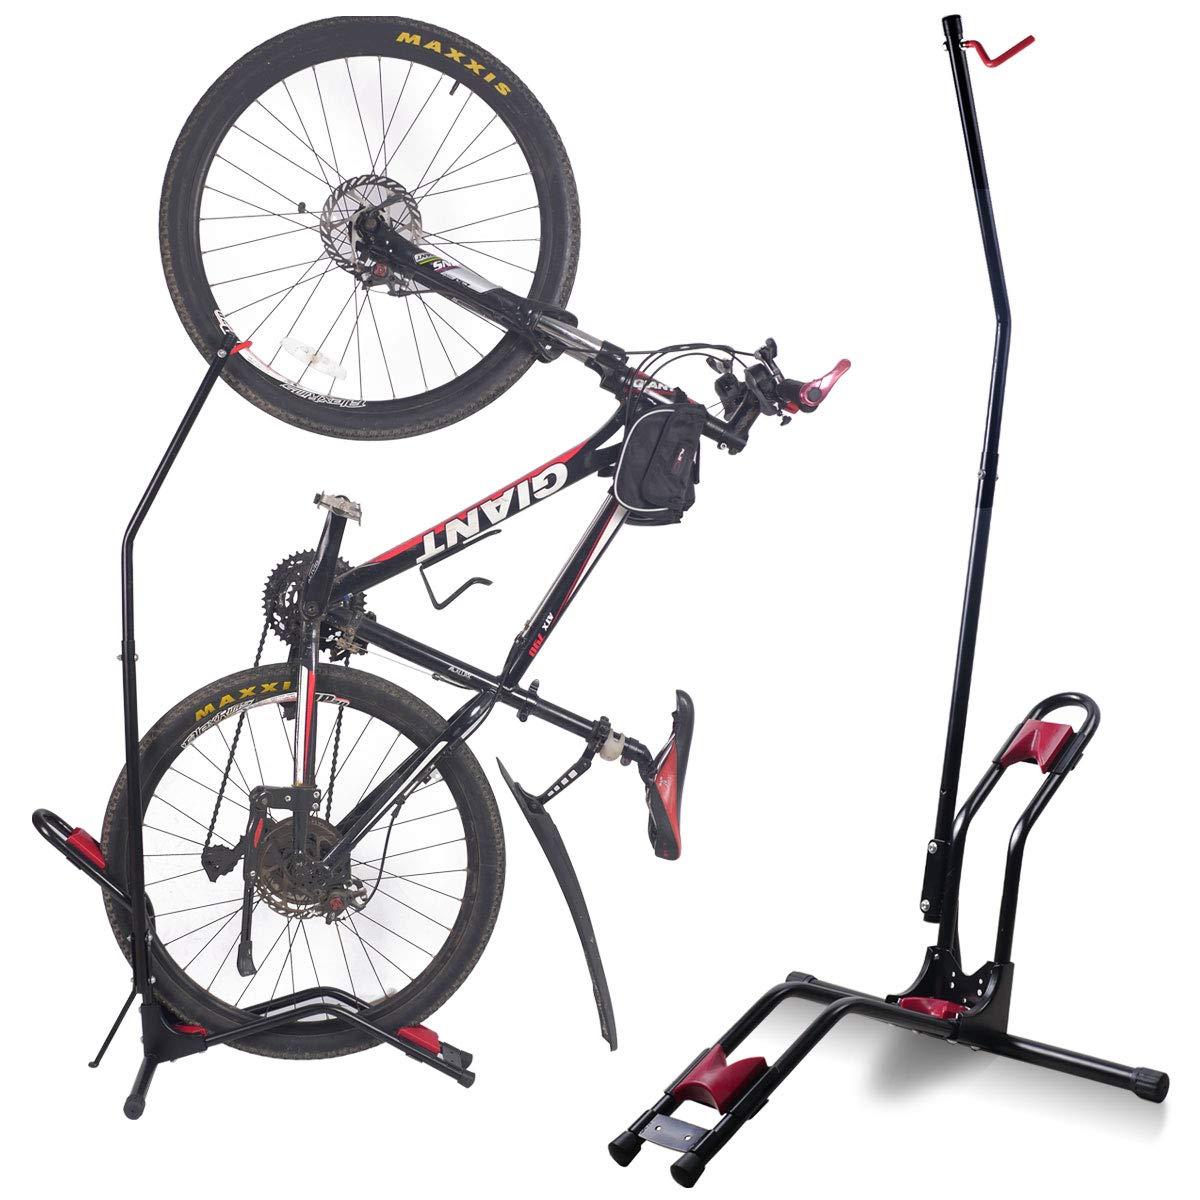 Dinsam トップバイク フロアパーキングラック ストレージスタンド 自転車フロアスタンド 垂直駐車 自転車 駐車ラック 多機能垂直型 使い方簡単   B07K51H97Q